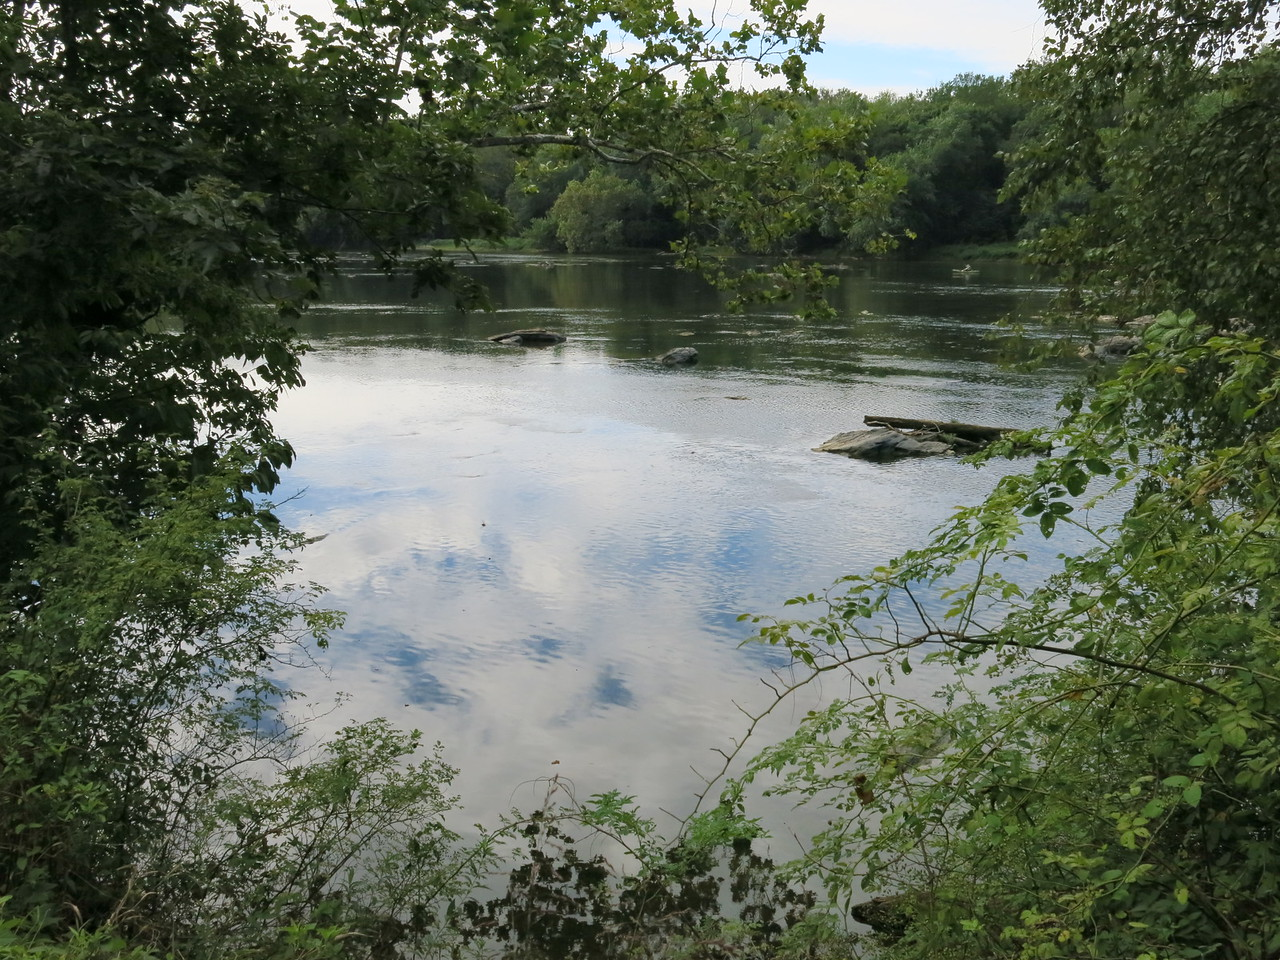 Calm and shallow Potomac River